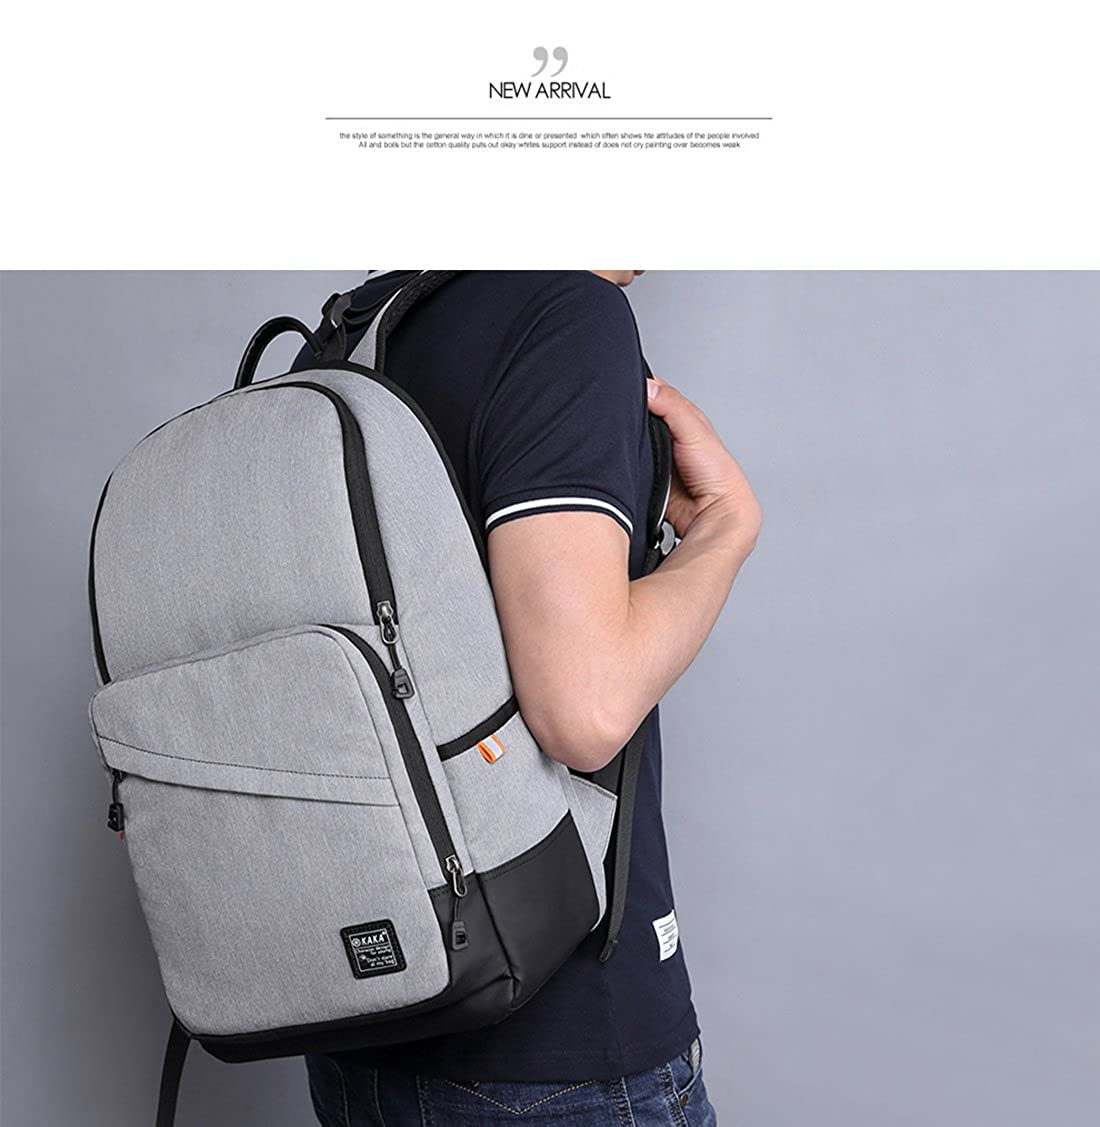 9bb3cd1dcc3e Amazon | FANDARE ファッションカジュアルバックパック15.6インチPCショルダーバッグリュックサック旅行ハイキングデイパック通学通勤鞄学生ラップトップタブレット多  ...